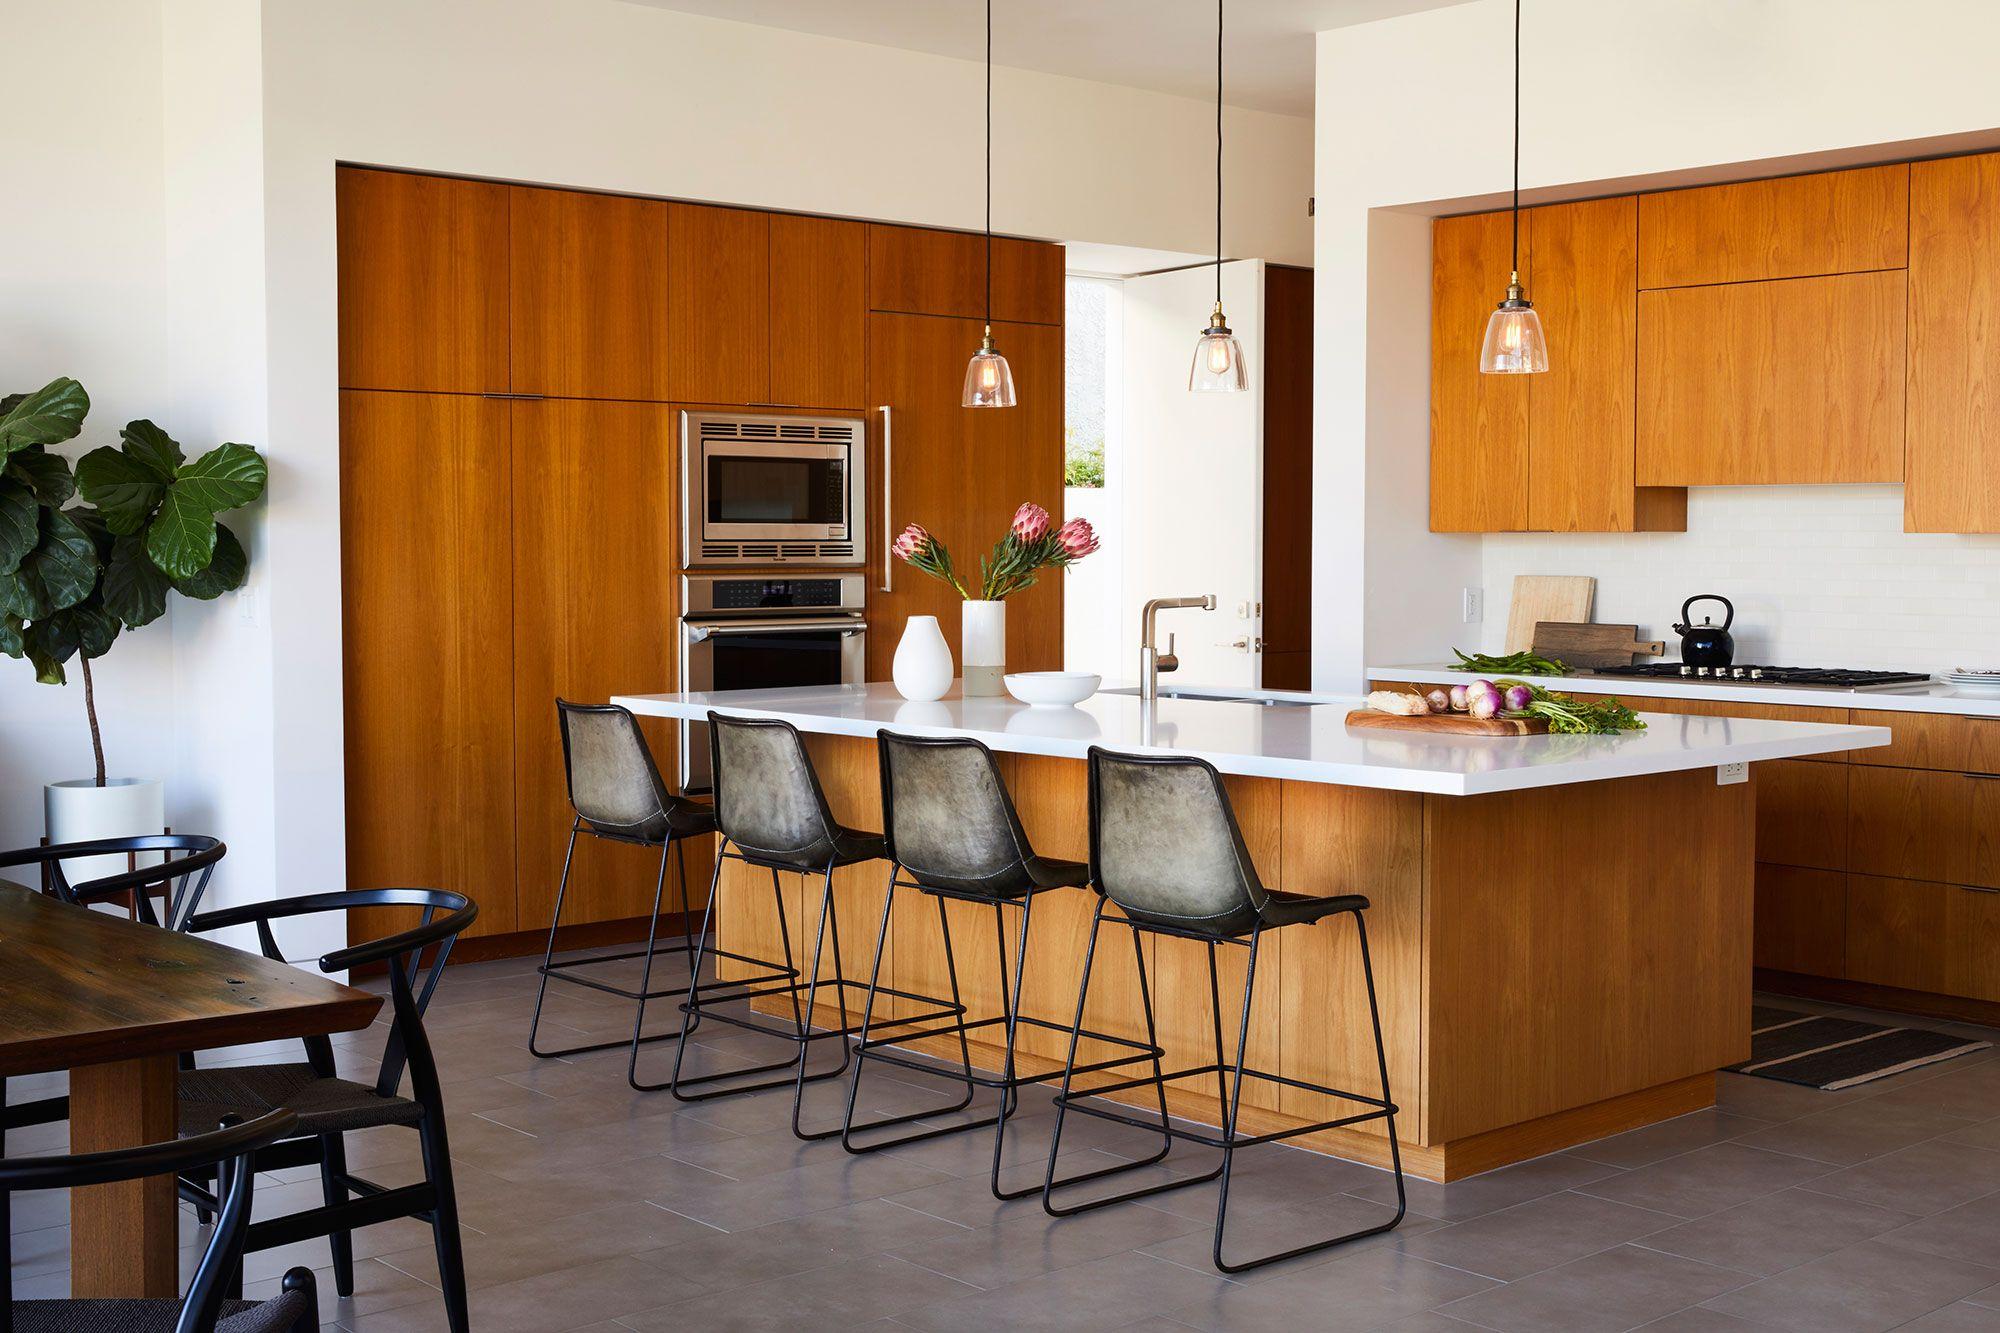 10 best modern kitchen cabinet ideas chic modern cabinet design rh housebeautiful com cheapest modern kitchen cabinets